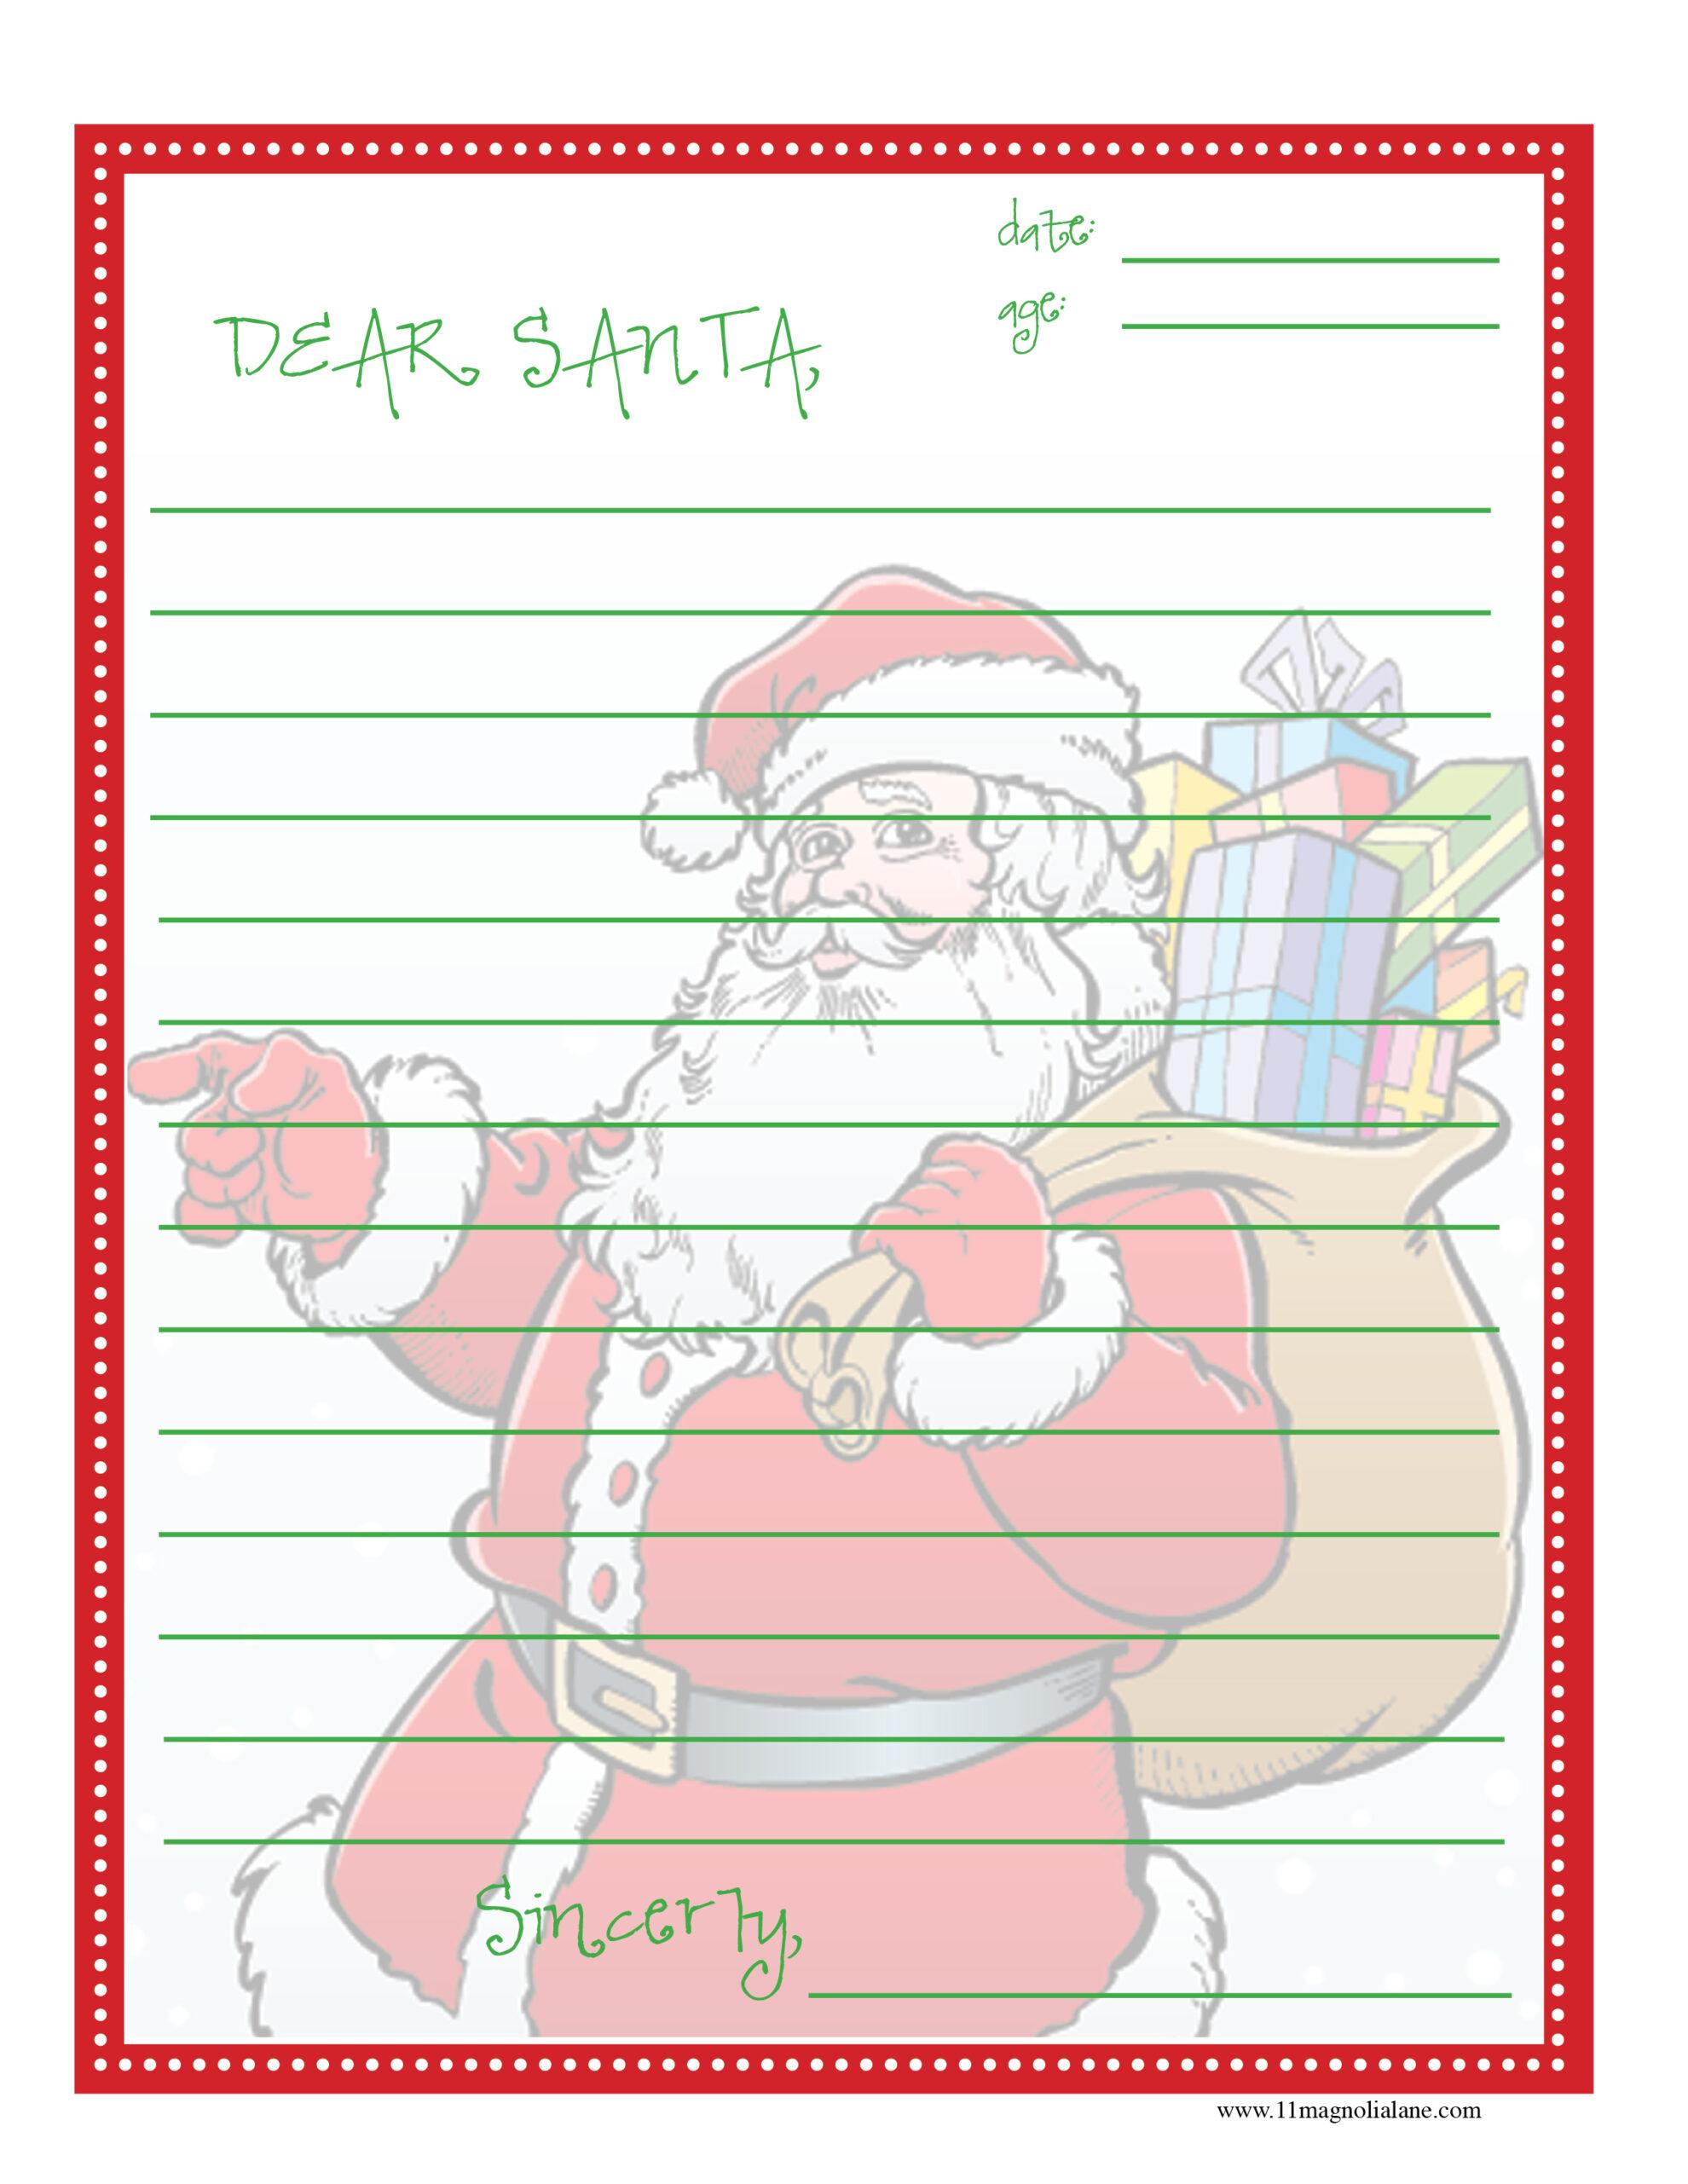 ... Photos - More Amusing Dear Santa Letters Dear Santa Mommy Says That